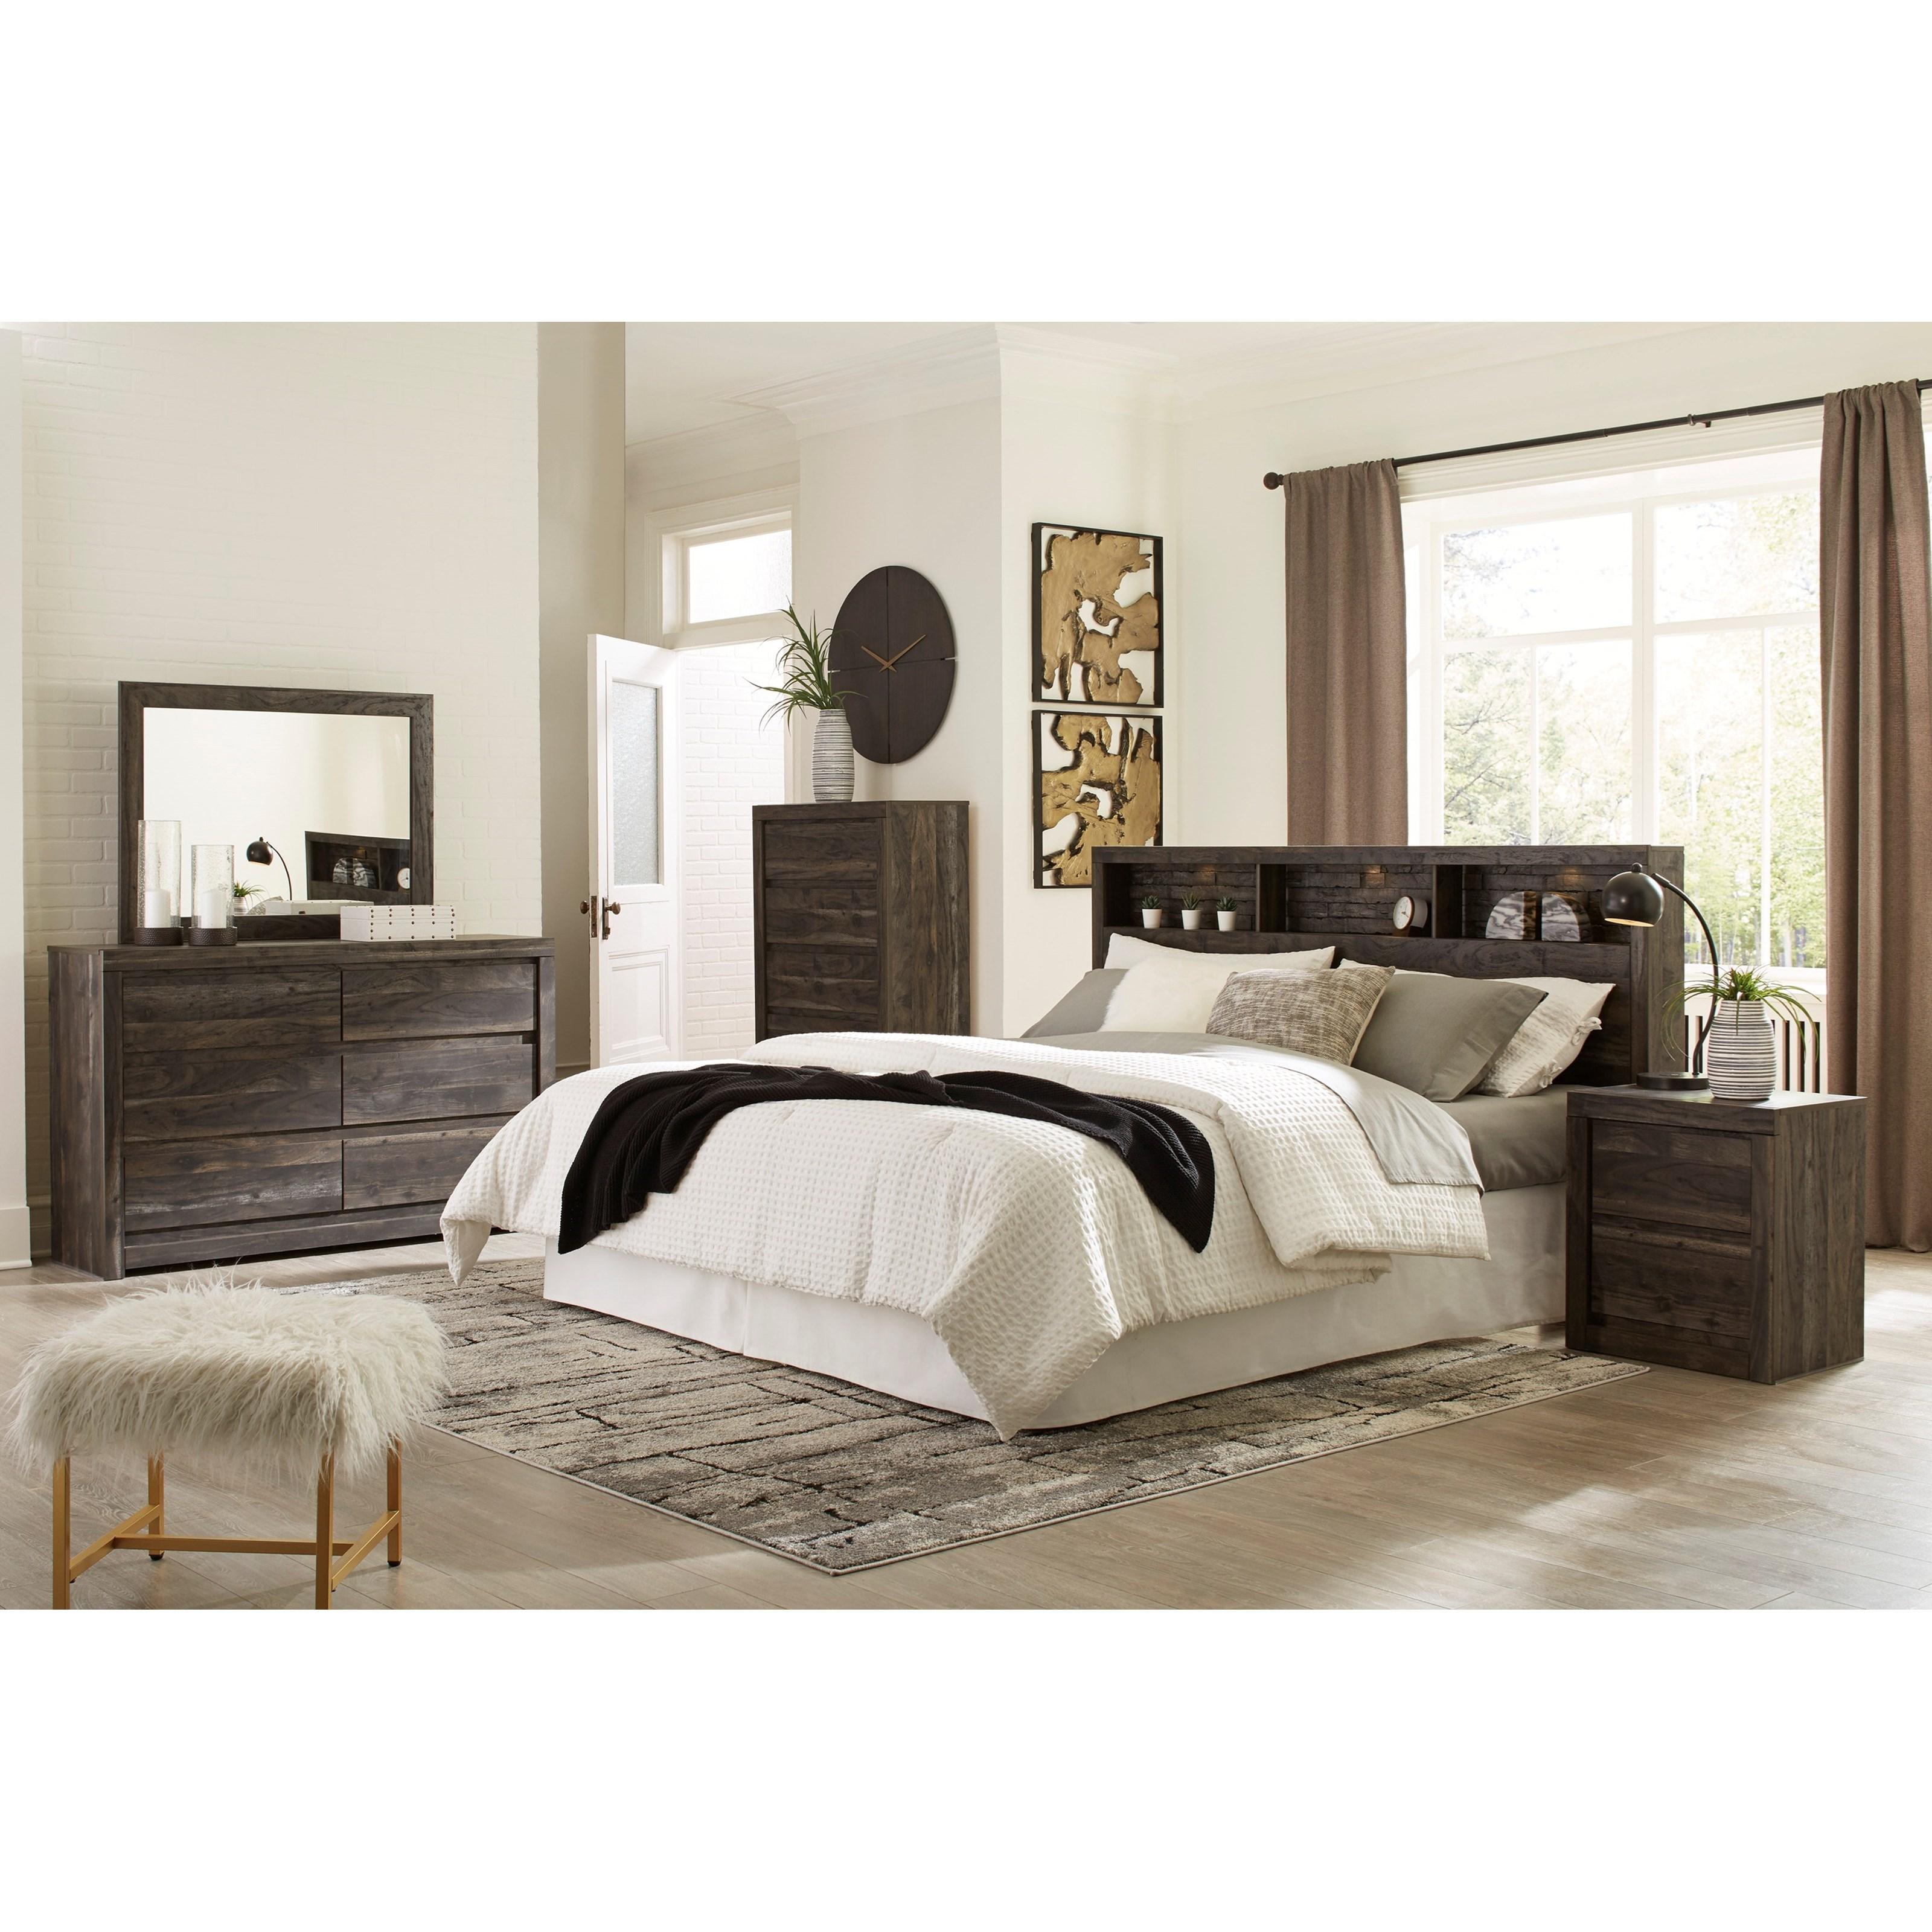 Vay Bay King Bedroom Group by Benchcraft at Furniture Barn